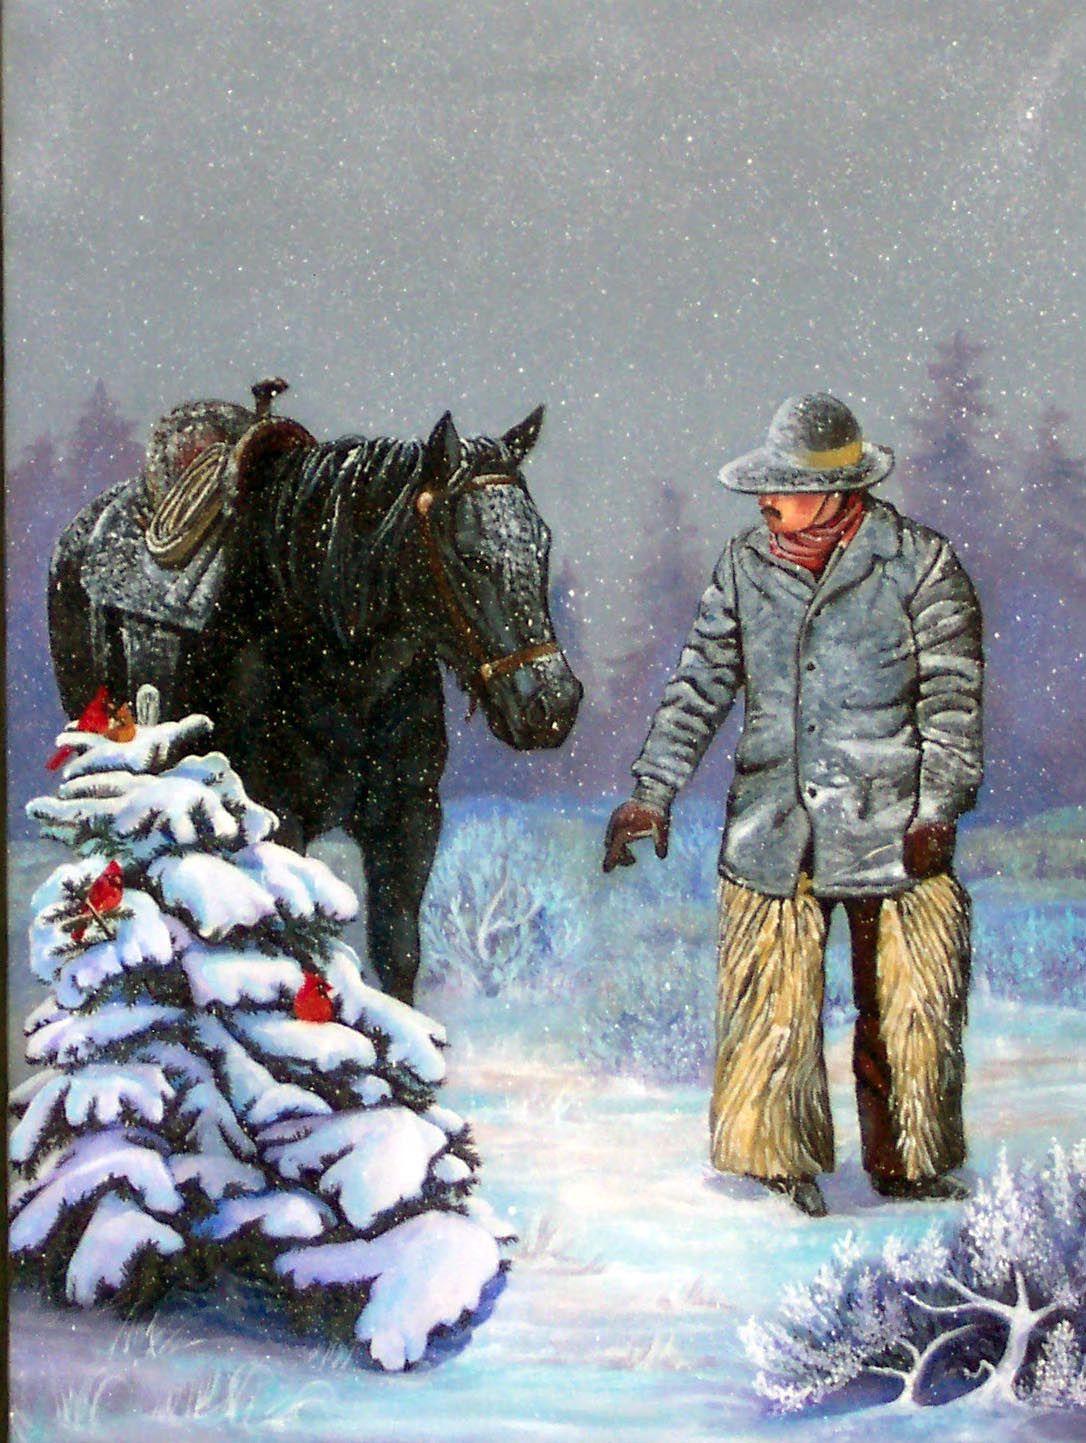 Cowboy Christmas | Christmas | Pinterest | Cowboy christmas ...